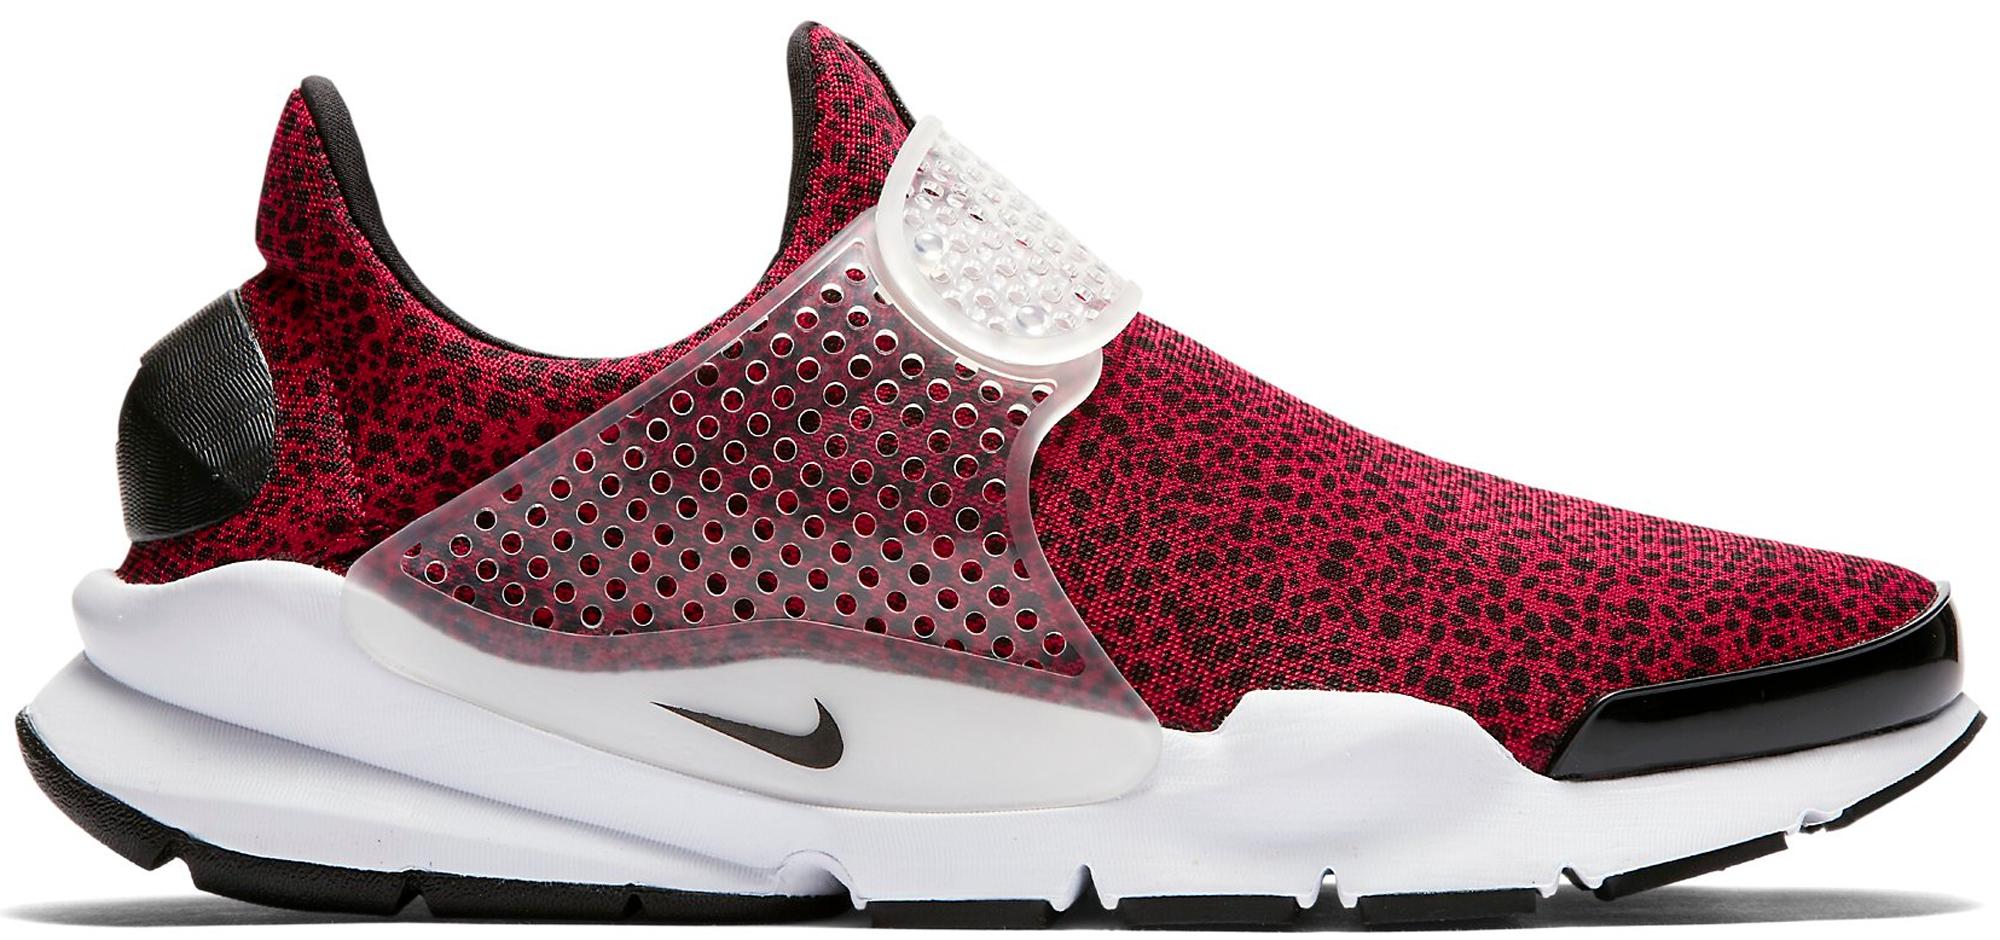 b18fe85822f Nike Sock Dart Safari Red - StockX News